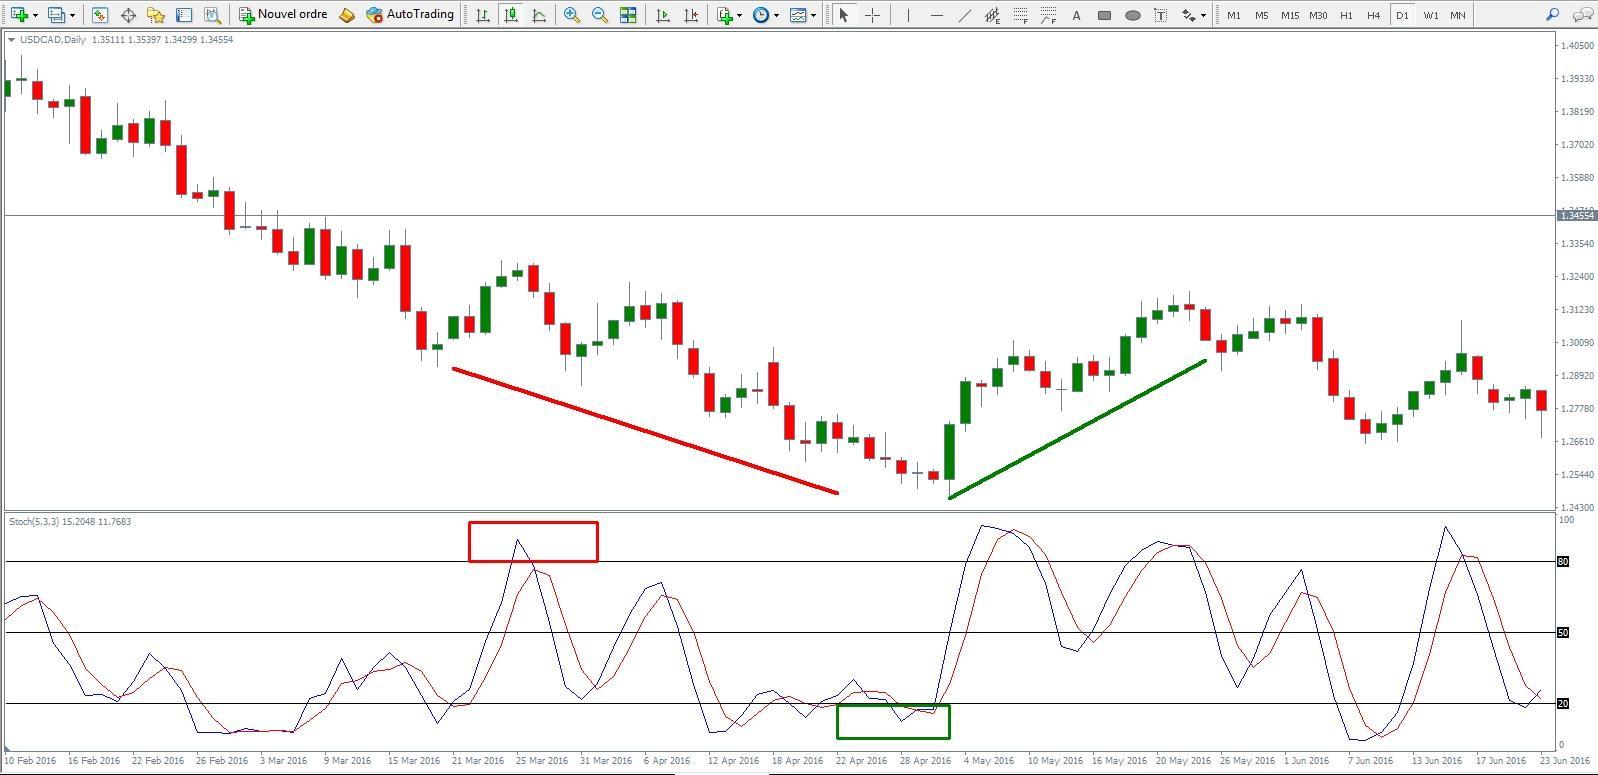 stochastic stock market indicator